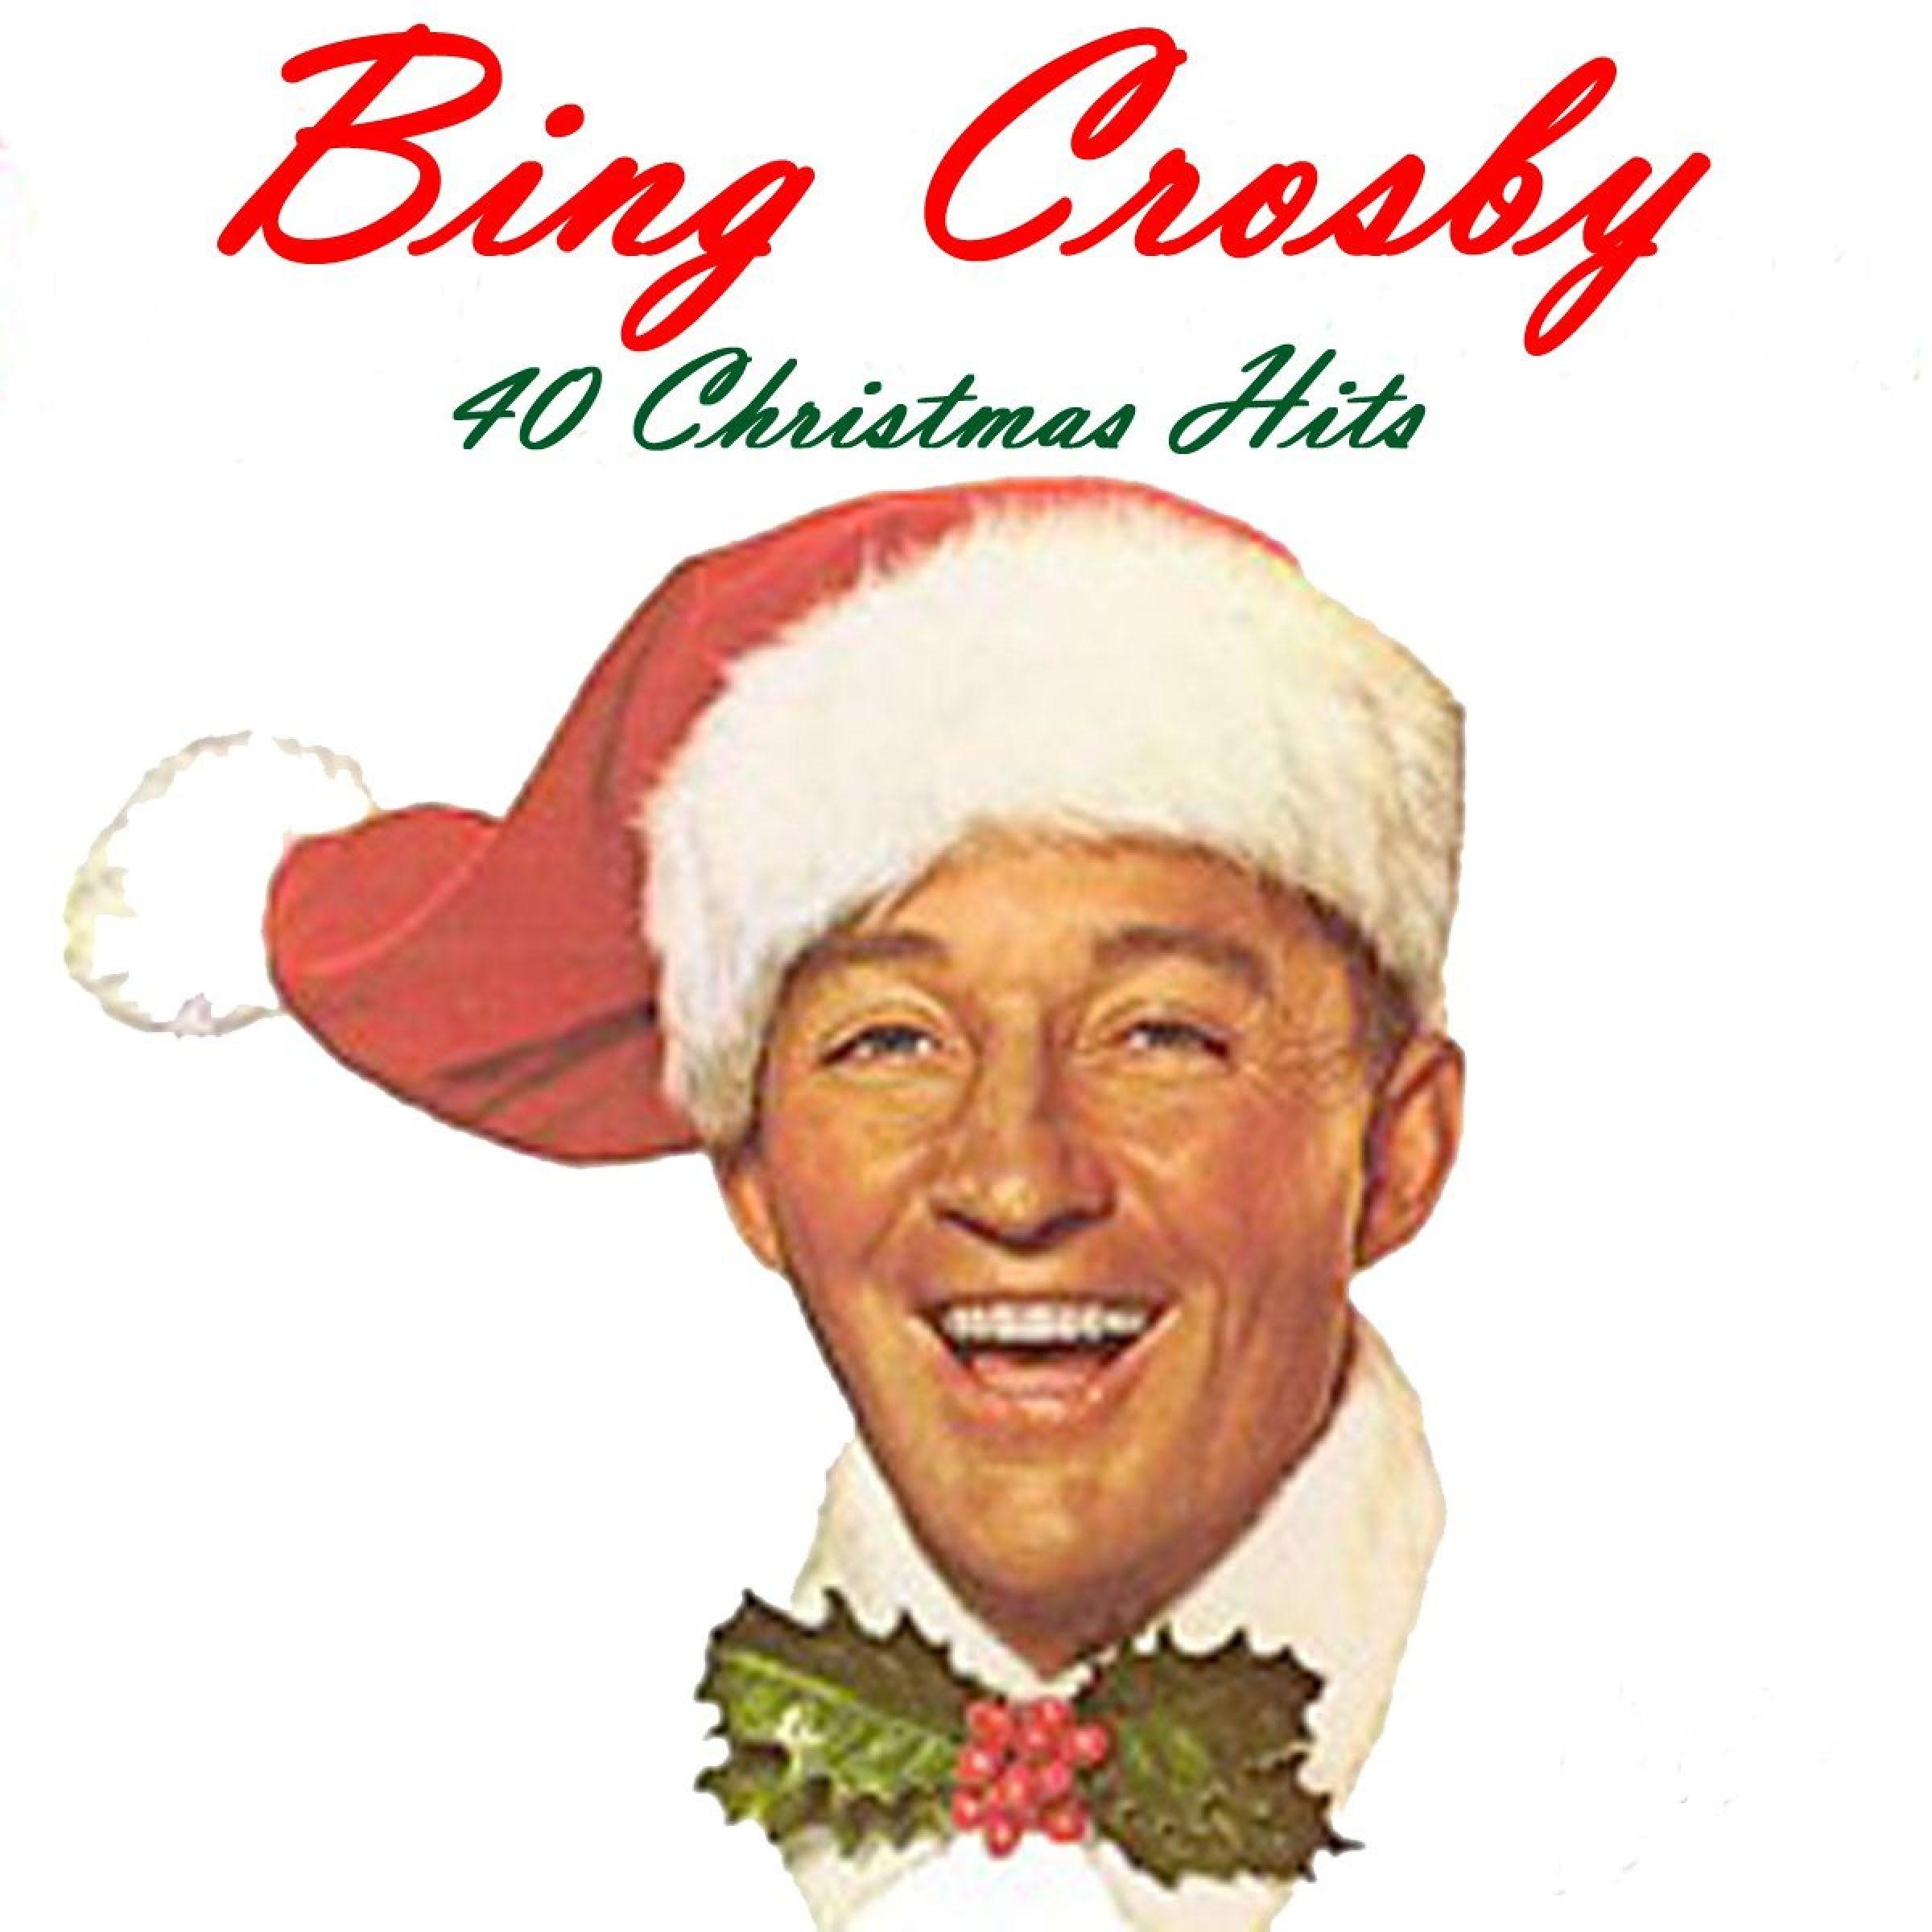 Bing Crosby 40 Christmas Hits (Original Mix) (AudioSonic